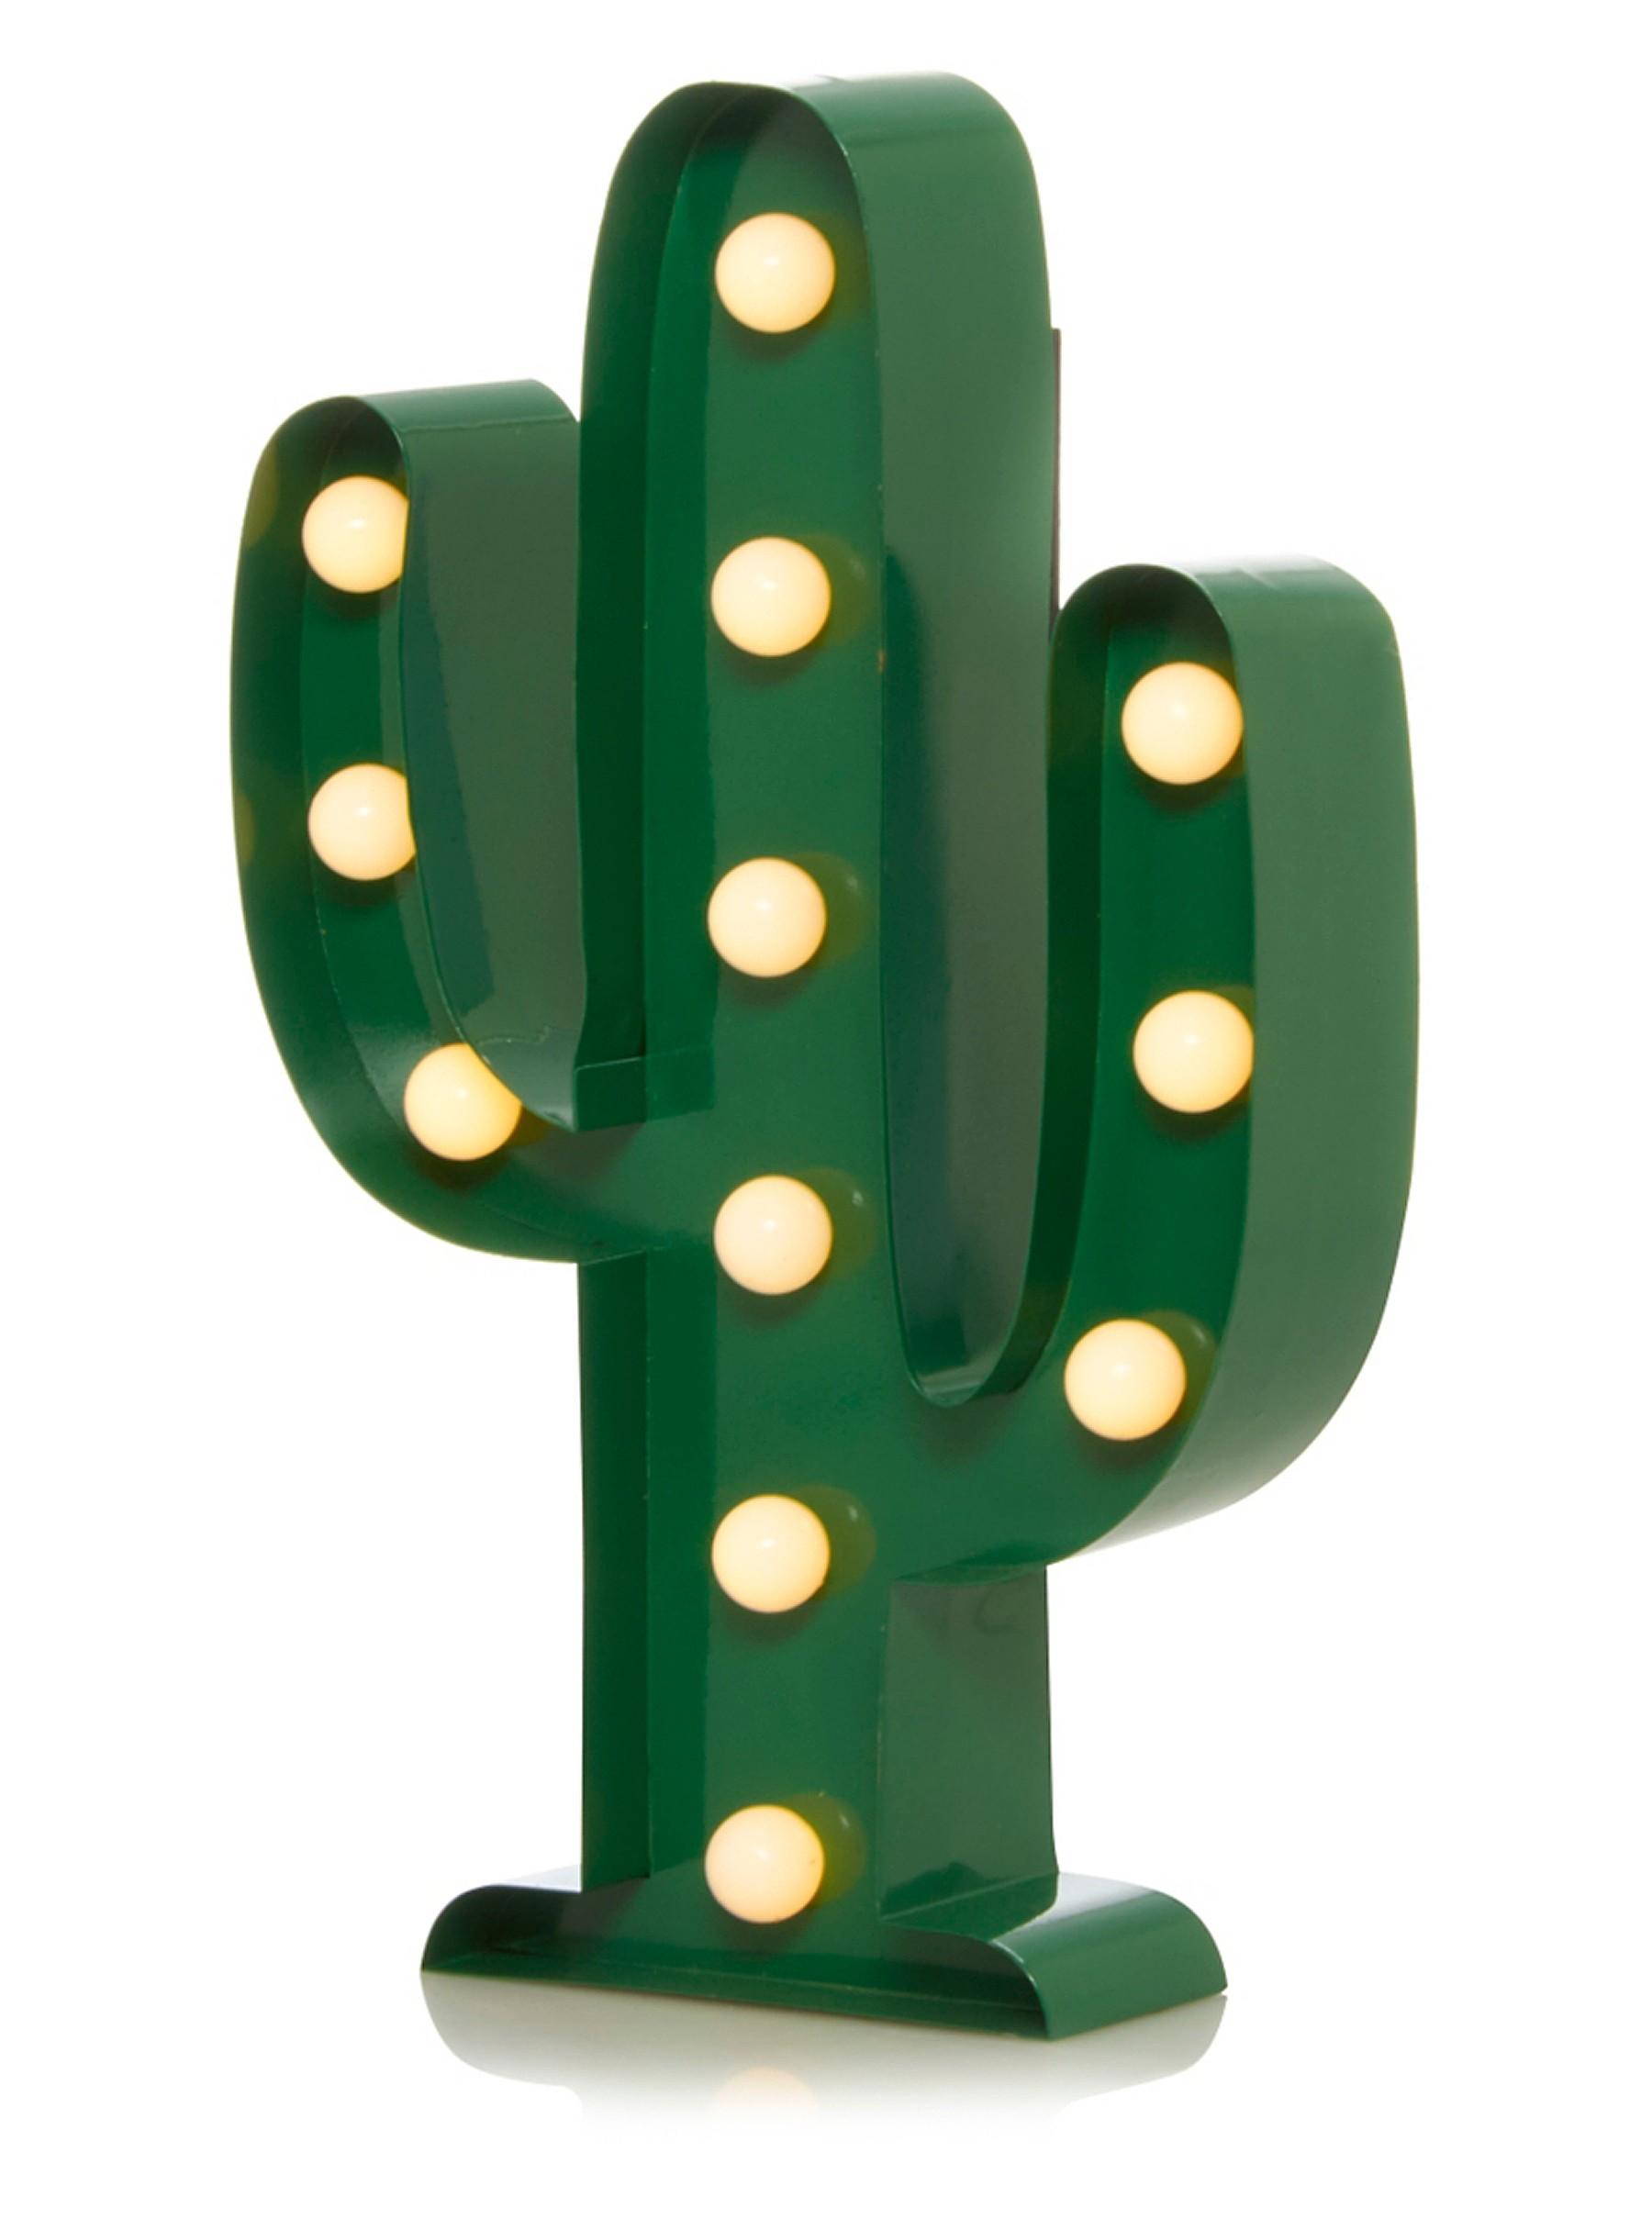 George Home - cactus light £10